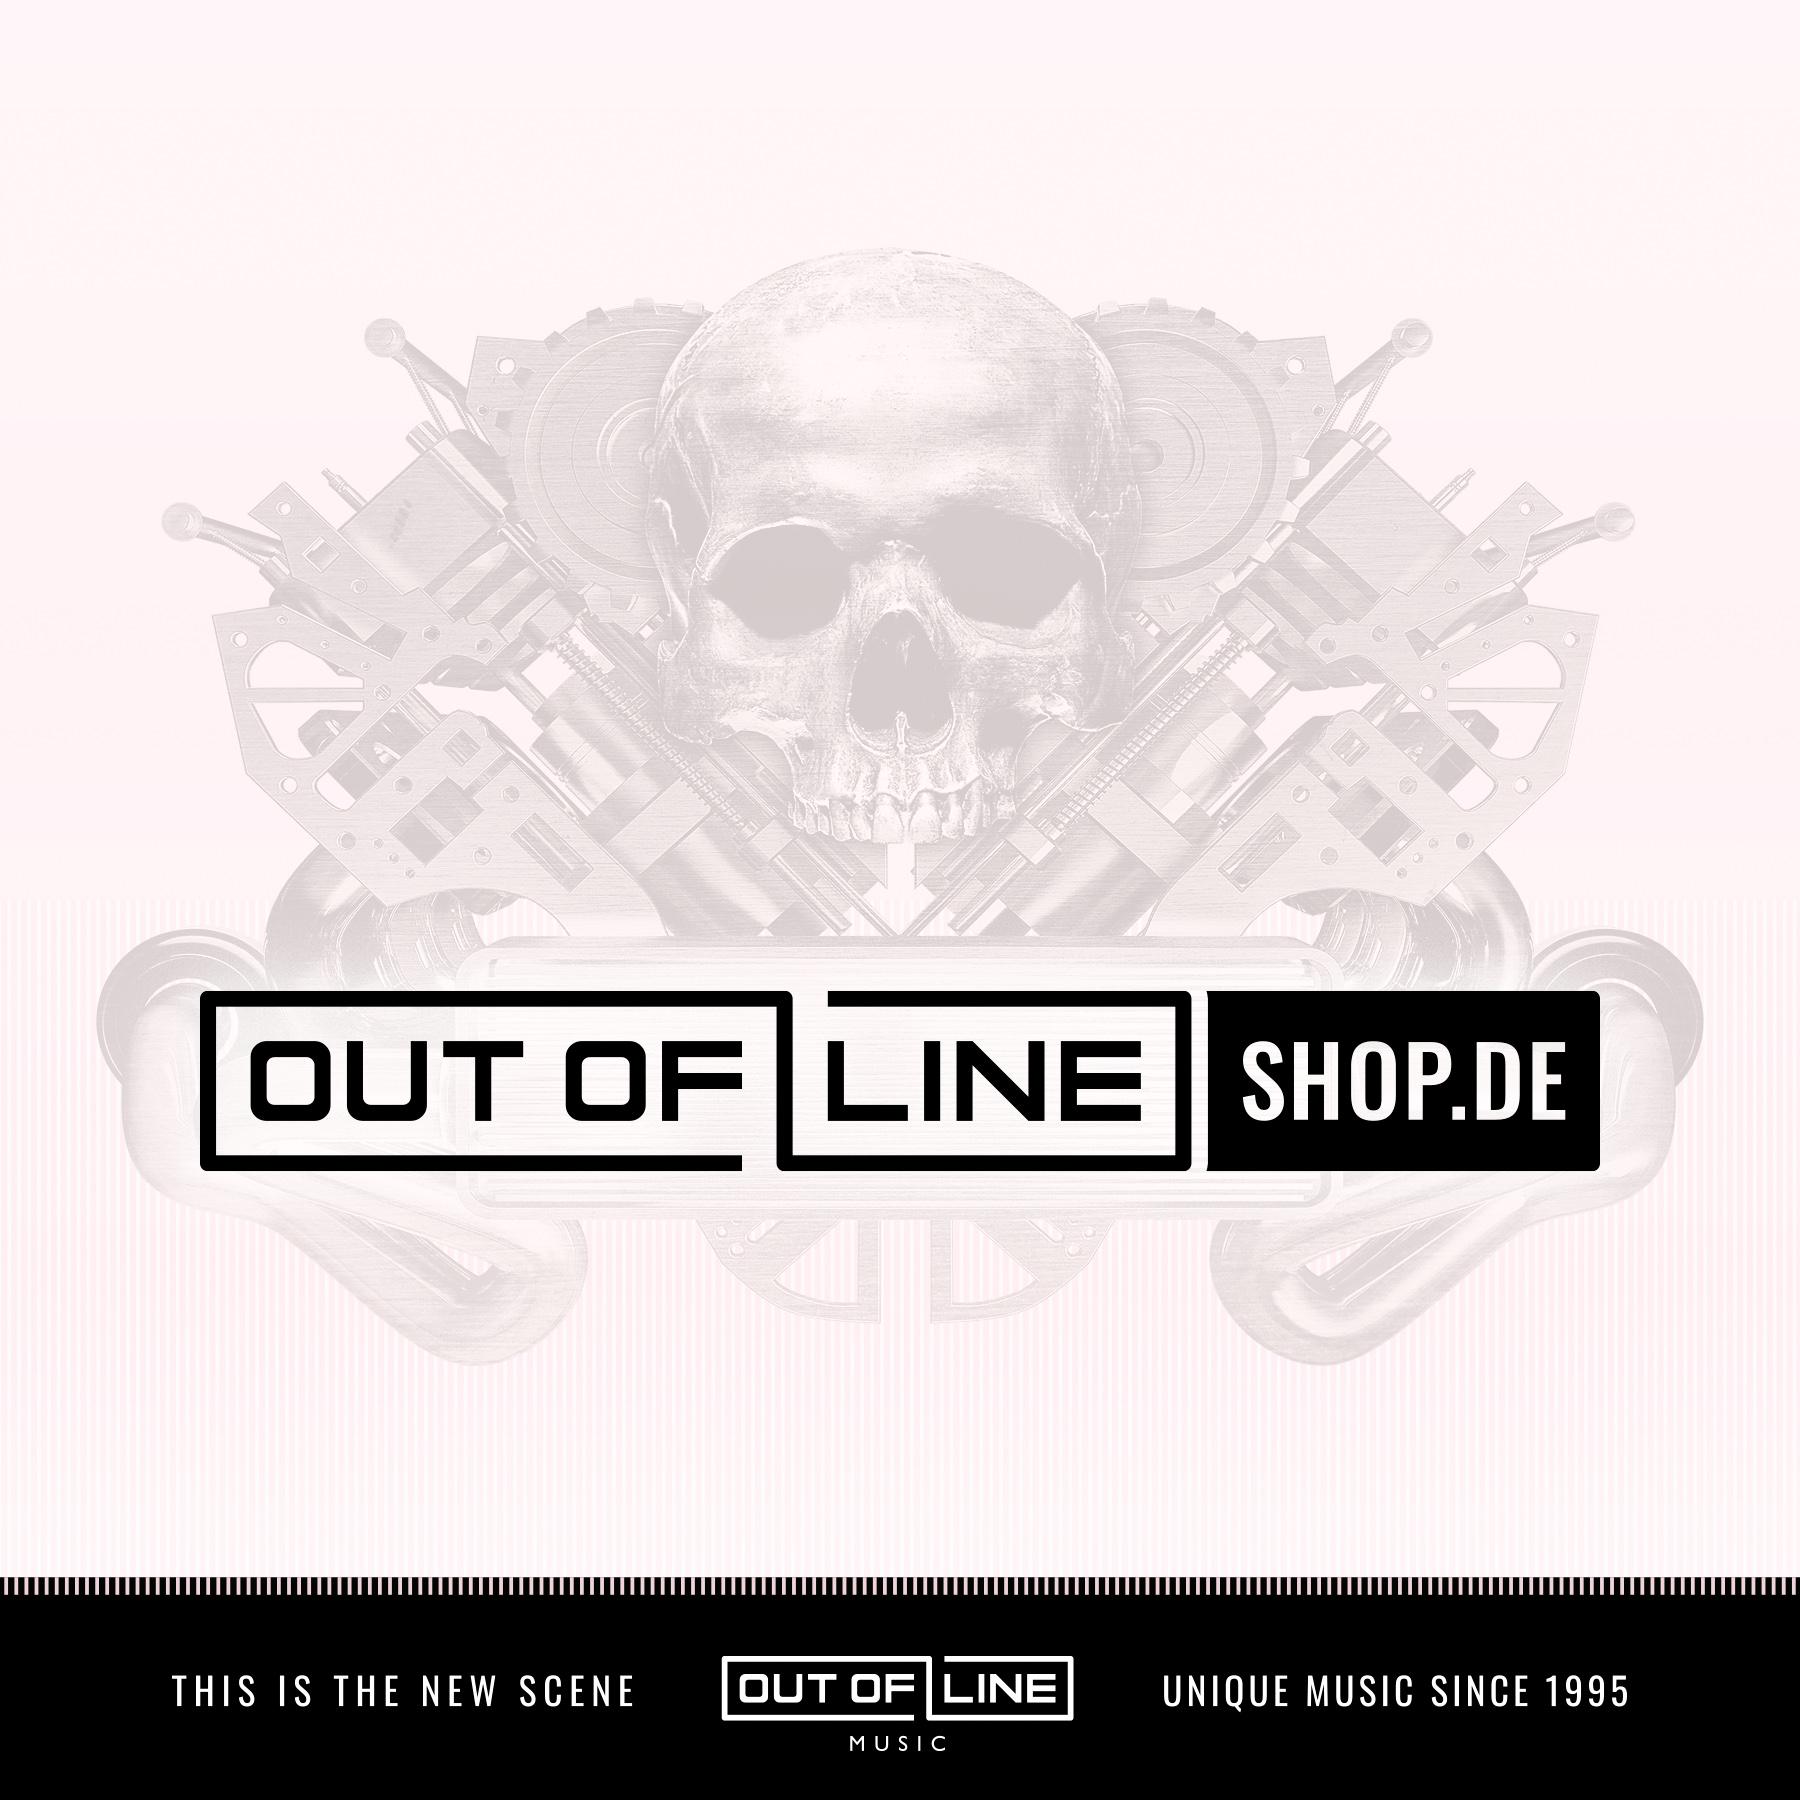 Blutengel - Kalender 2021 (Limited Edition) - Kalender/Calendar